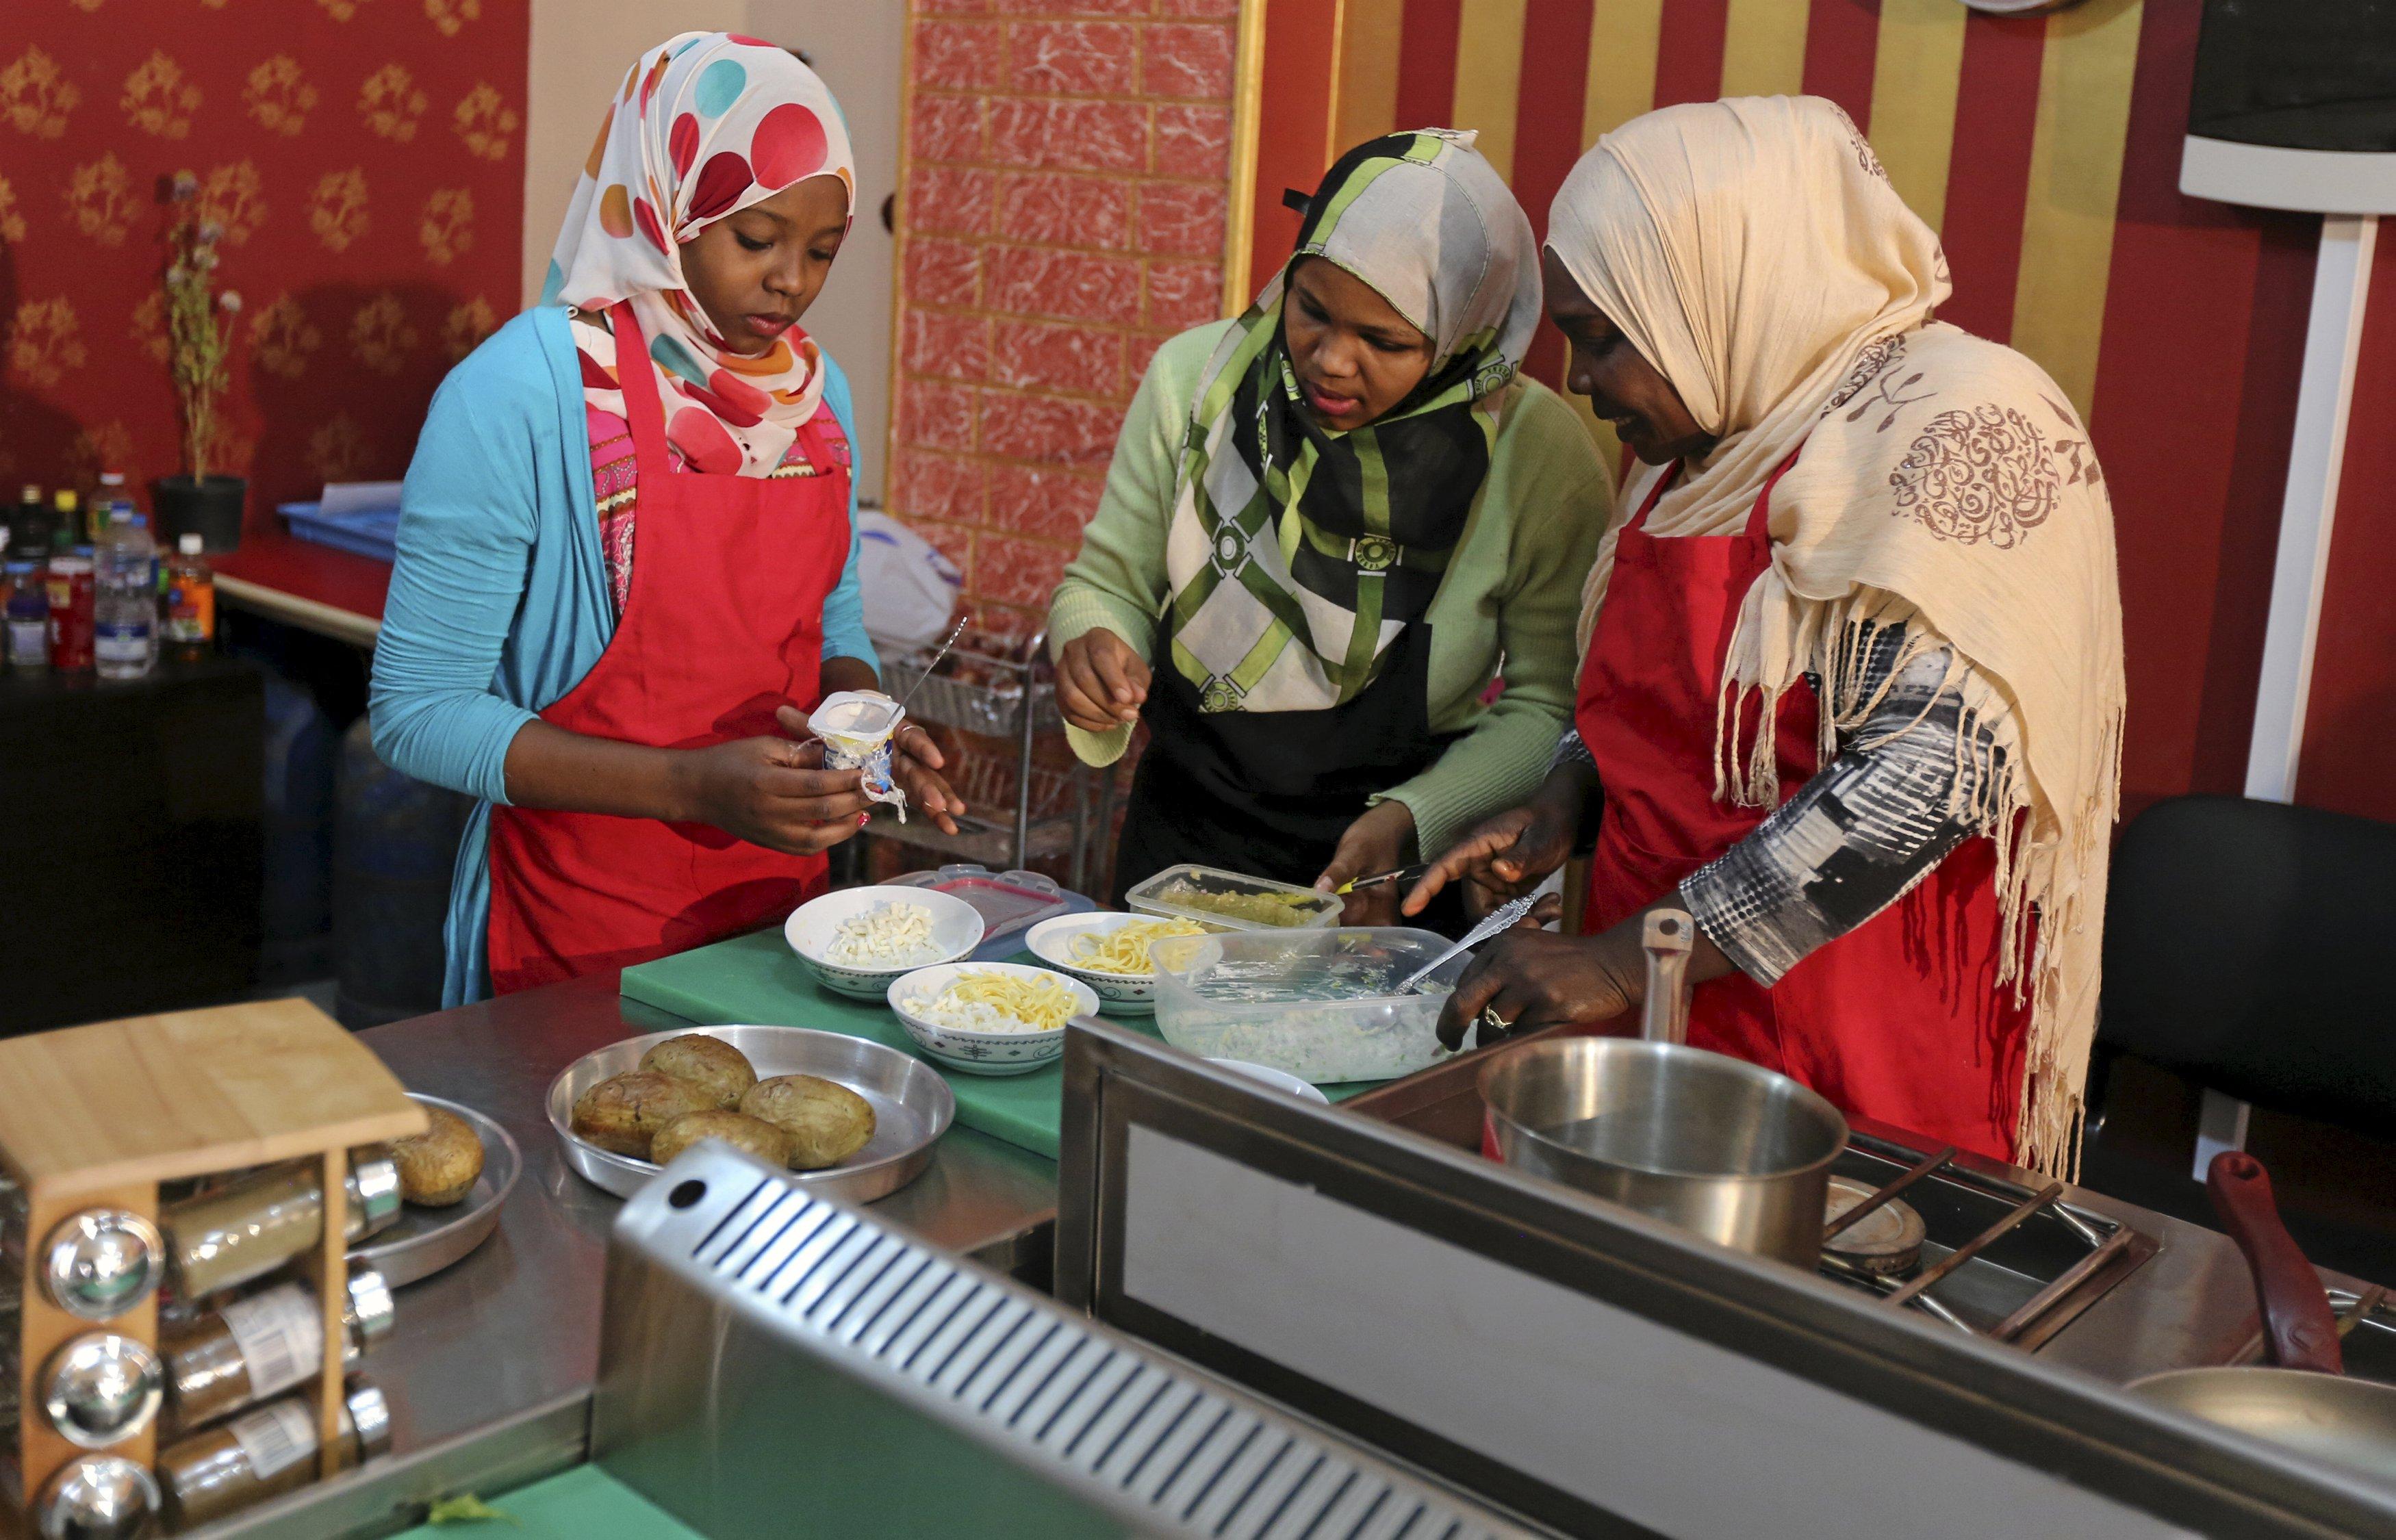 Homemade arab muslim egypt turkey pakistan cauc hijab - 2 2